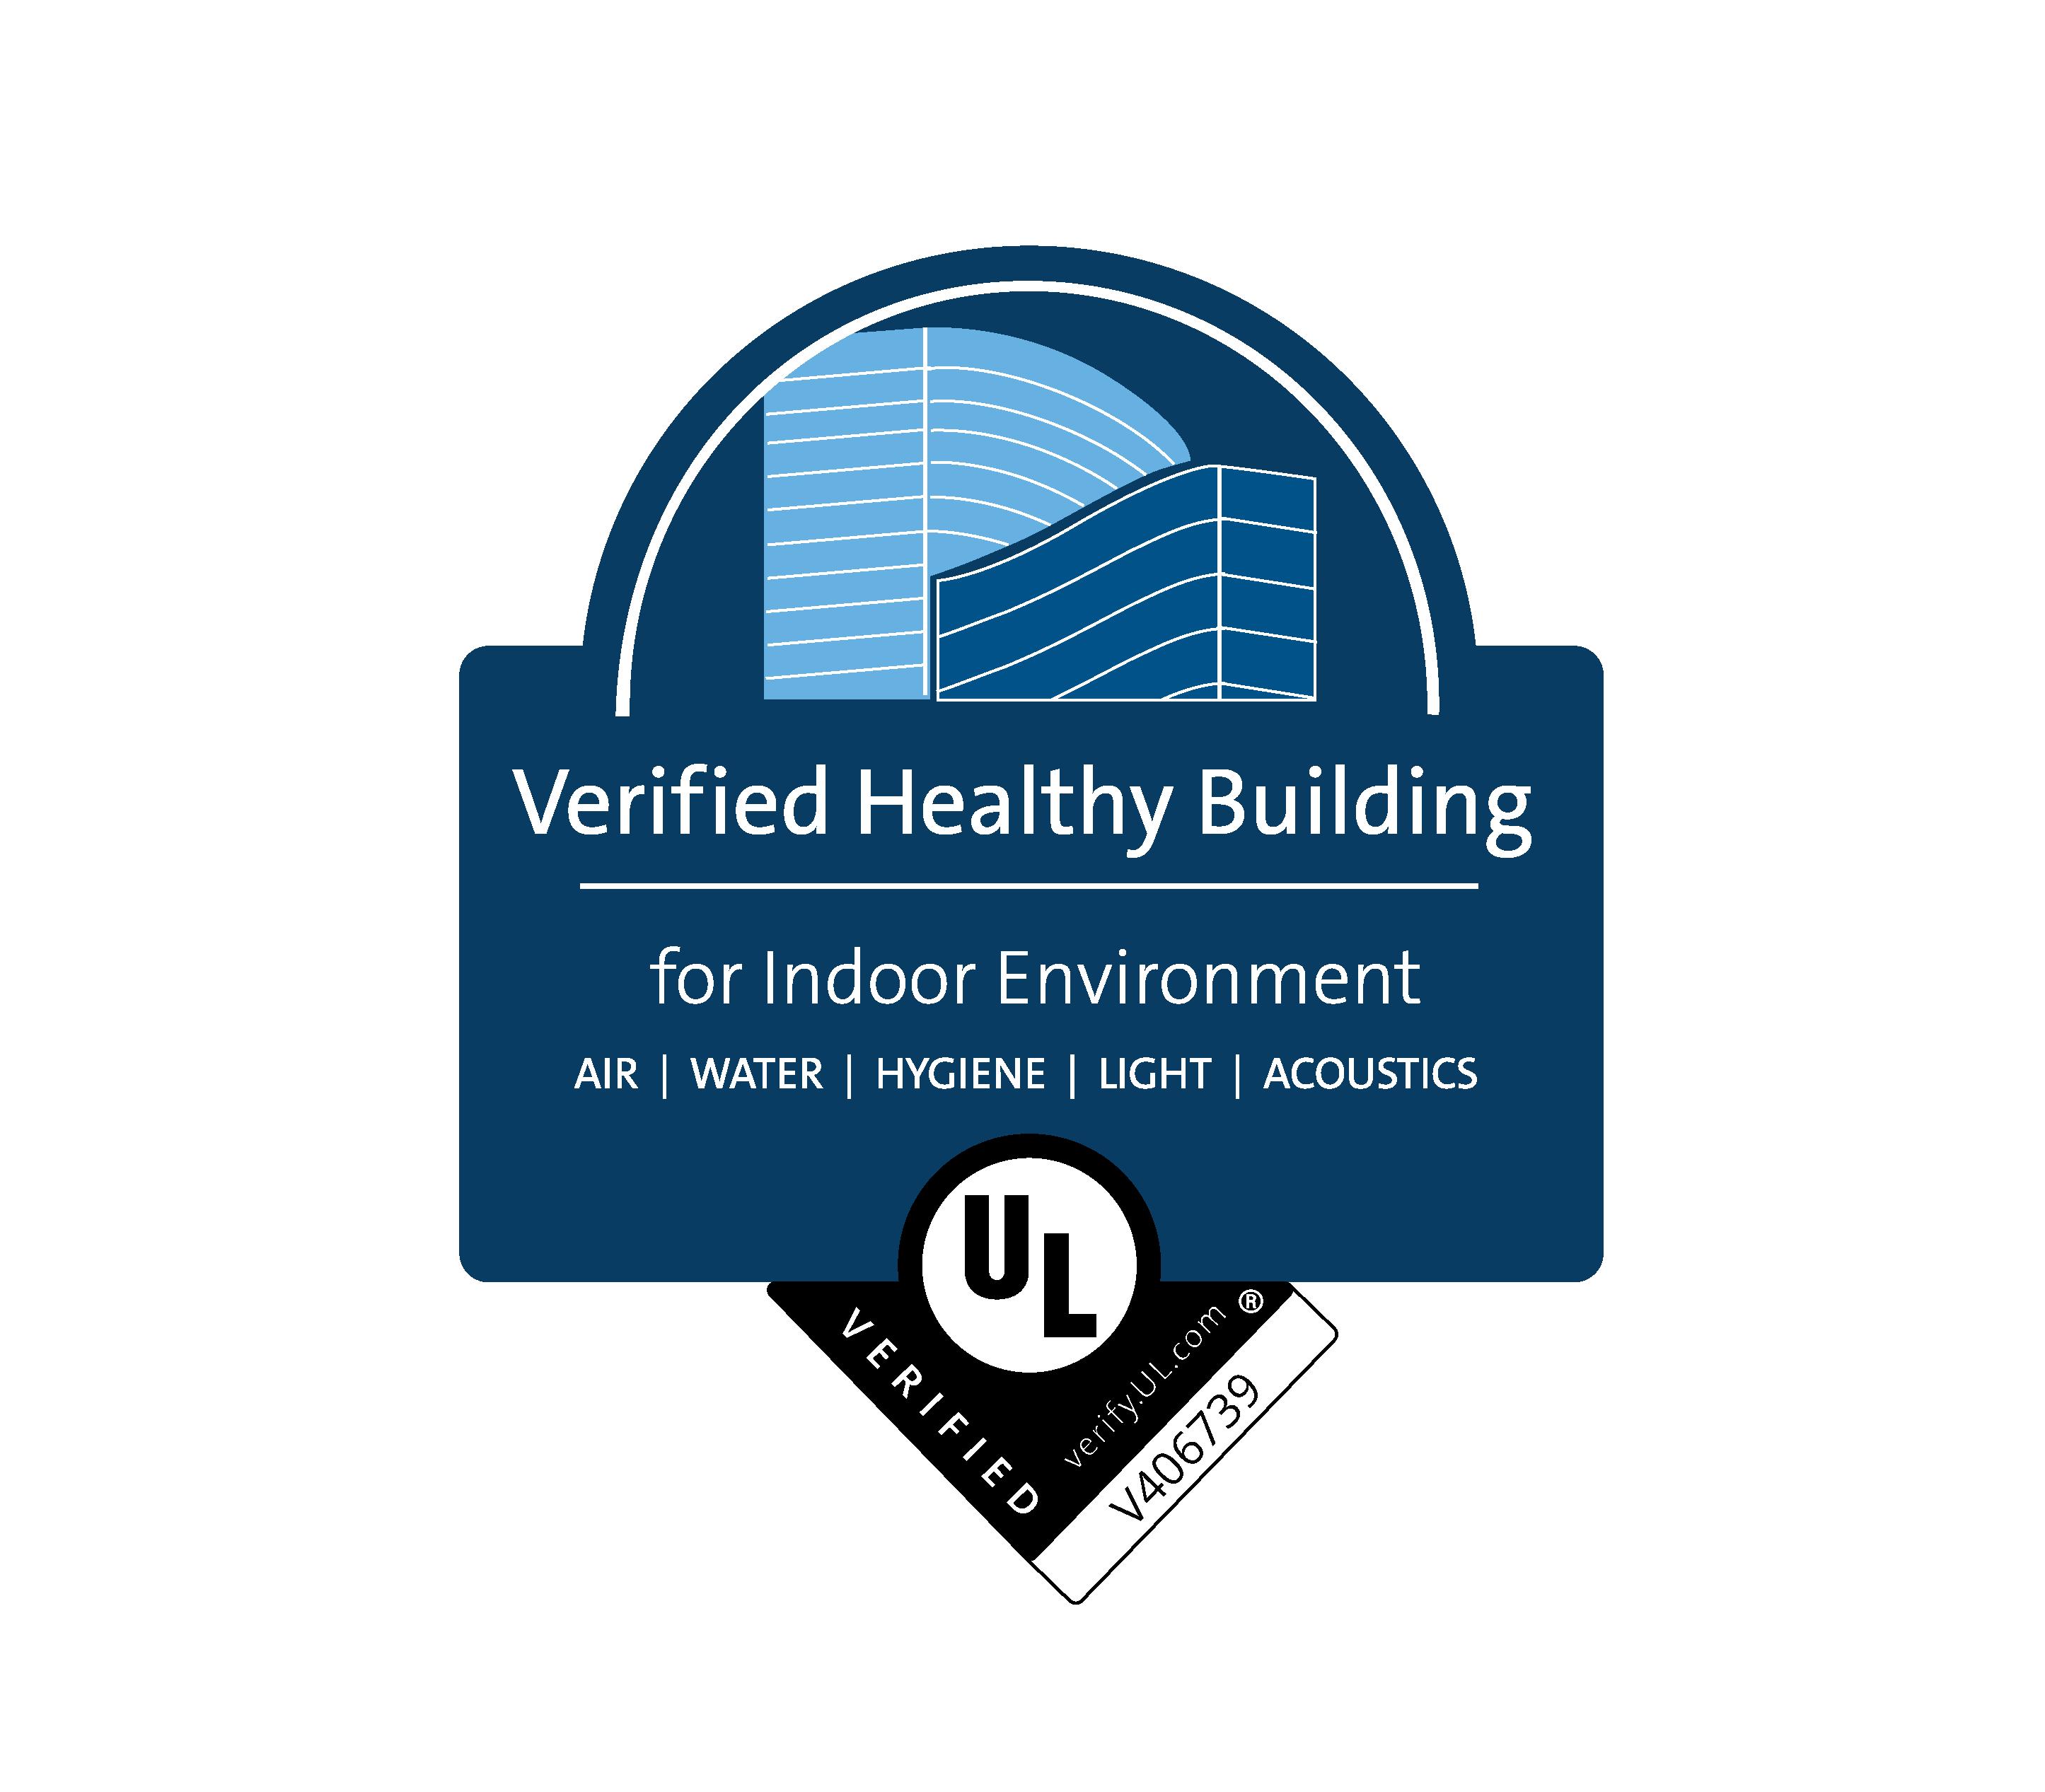 UL Verified Healthy Building